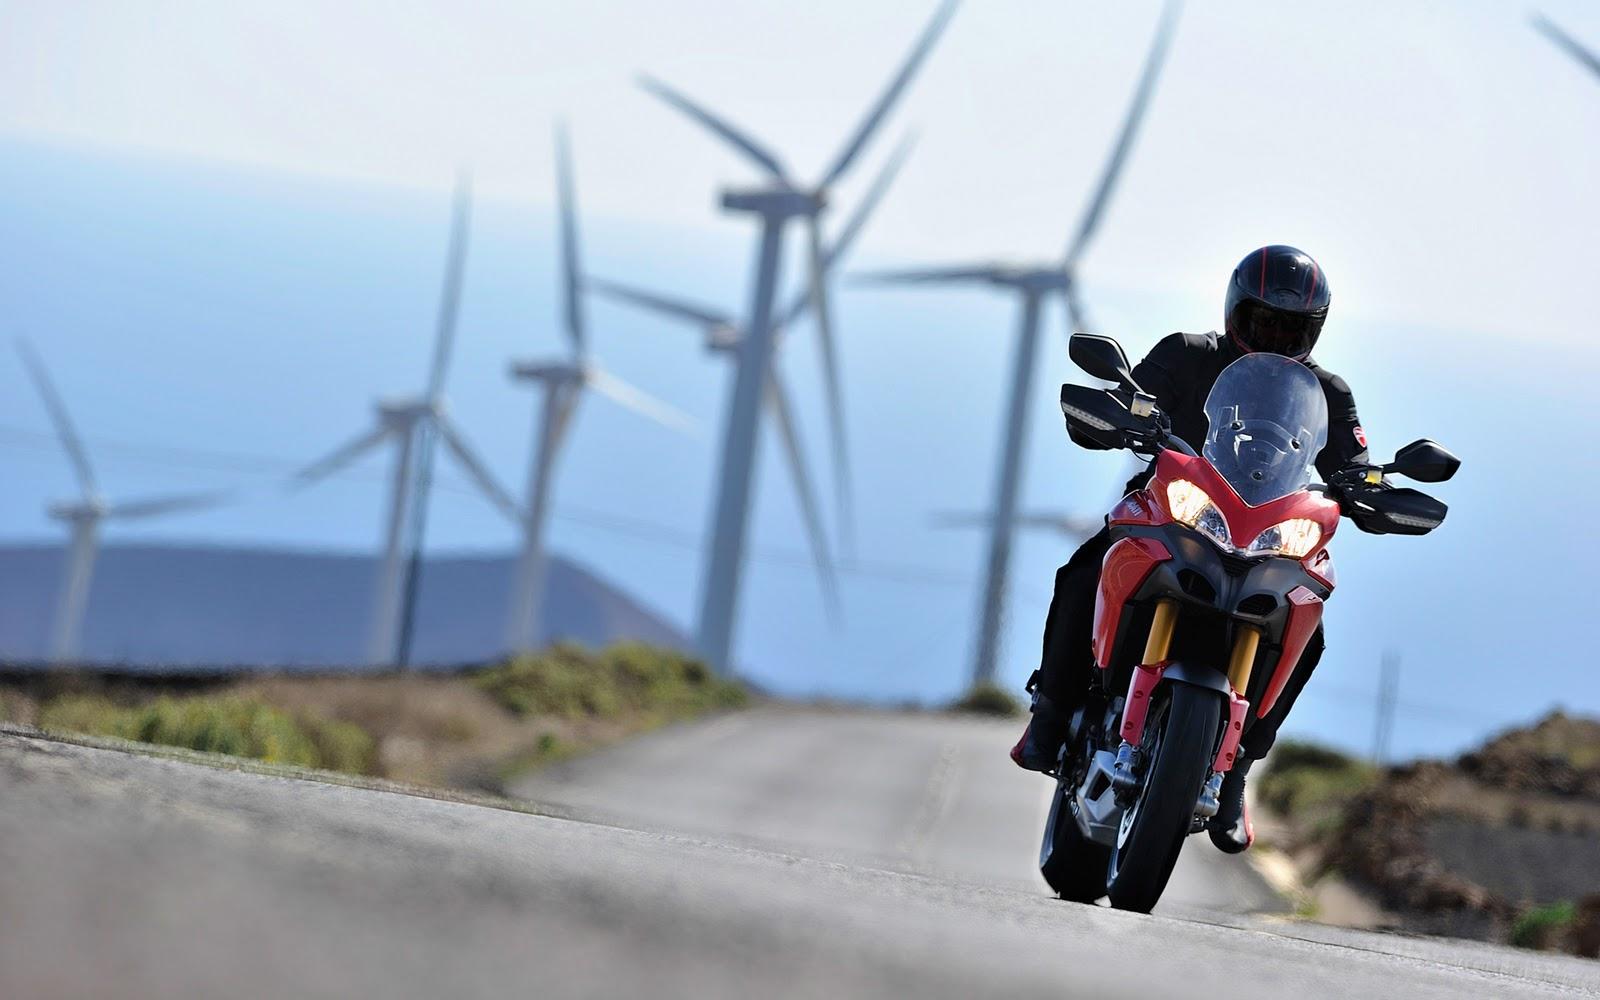 http://4.bp.blogspot.com/-wfgXtyPz8mo/ToO6376Q0eI/AAAAAAAAZgg/1Tl-85o9ZQU/s1600/Ducati+Wallpapers+-Multistrada.jpg